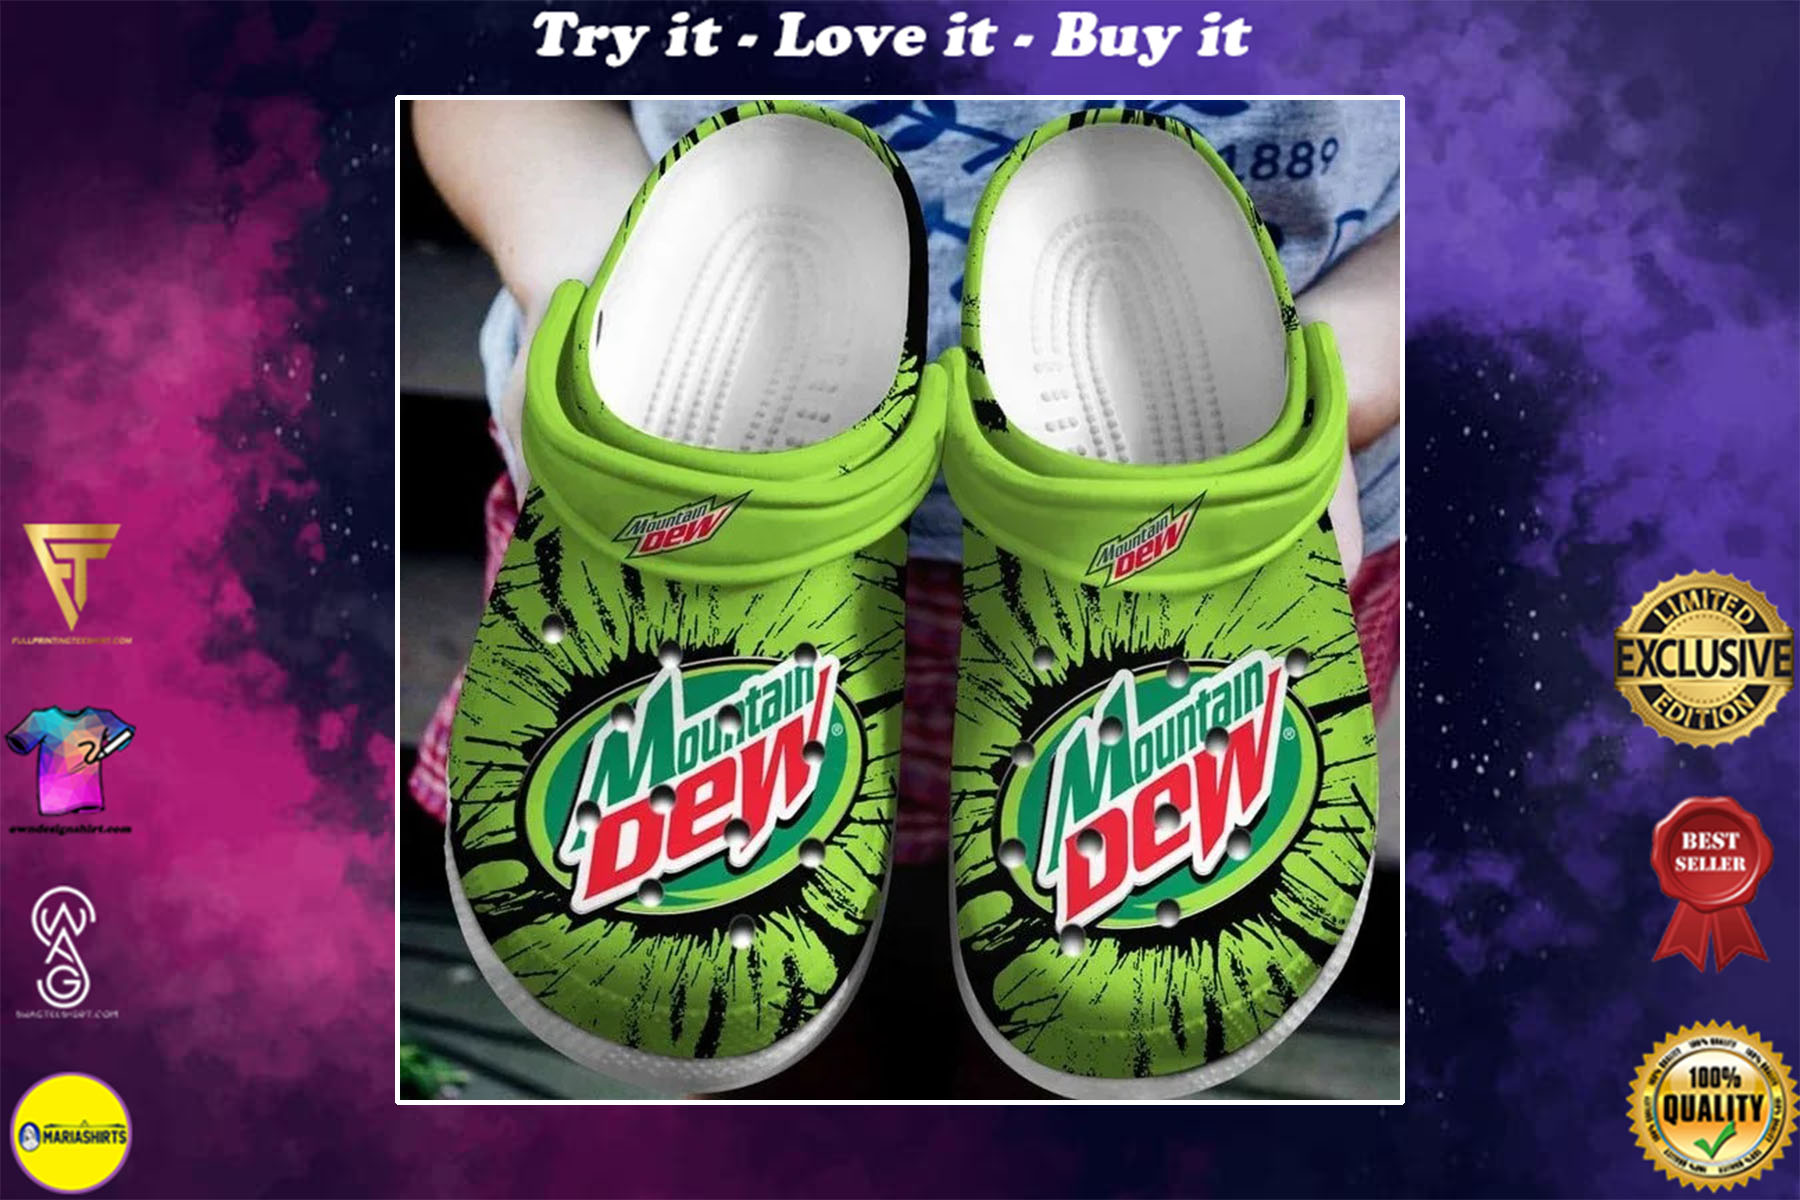 pepsico mountain dew crocs - Copy